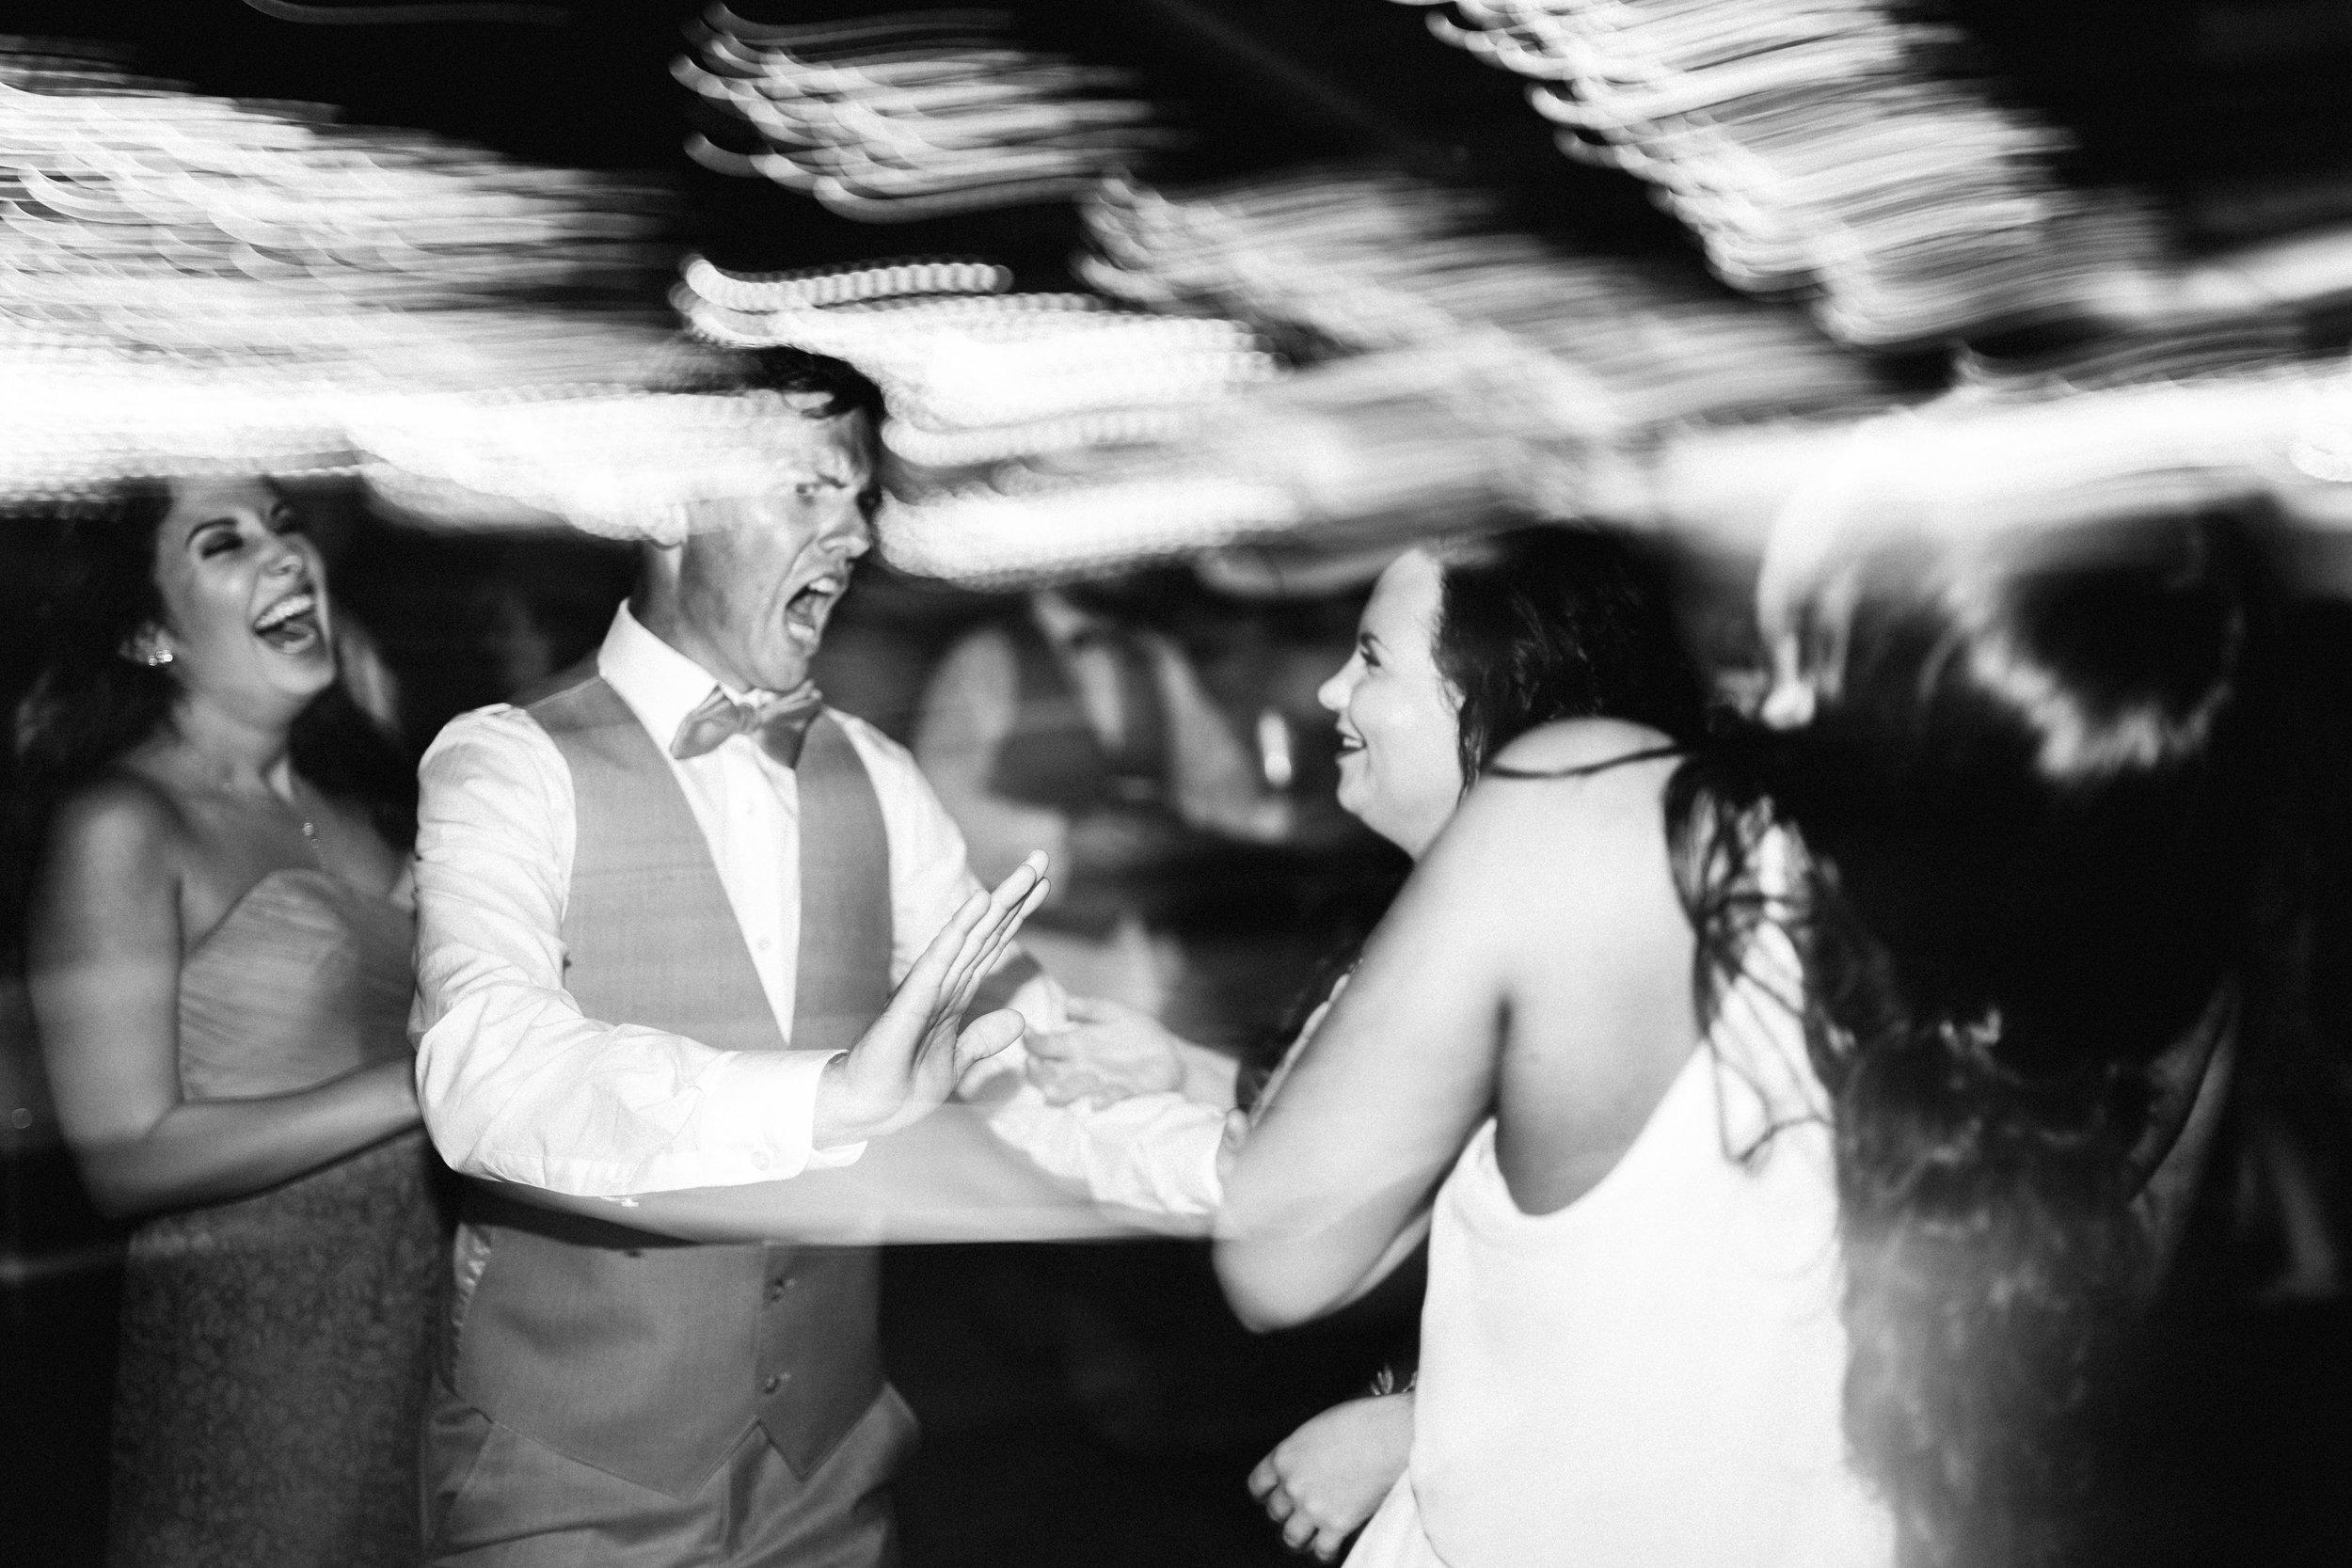 2017.10.14 Samantha and Matthew Crabtree Sarasota Wedding (571 of 708).jpg